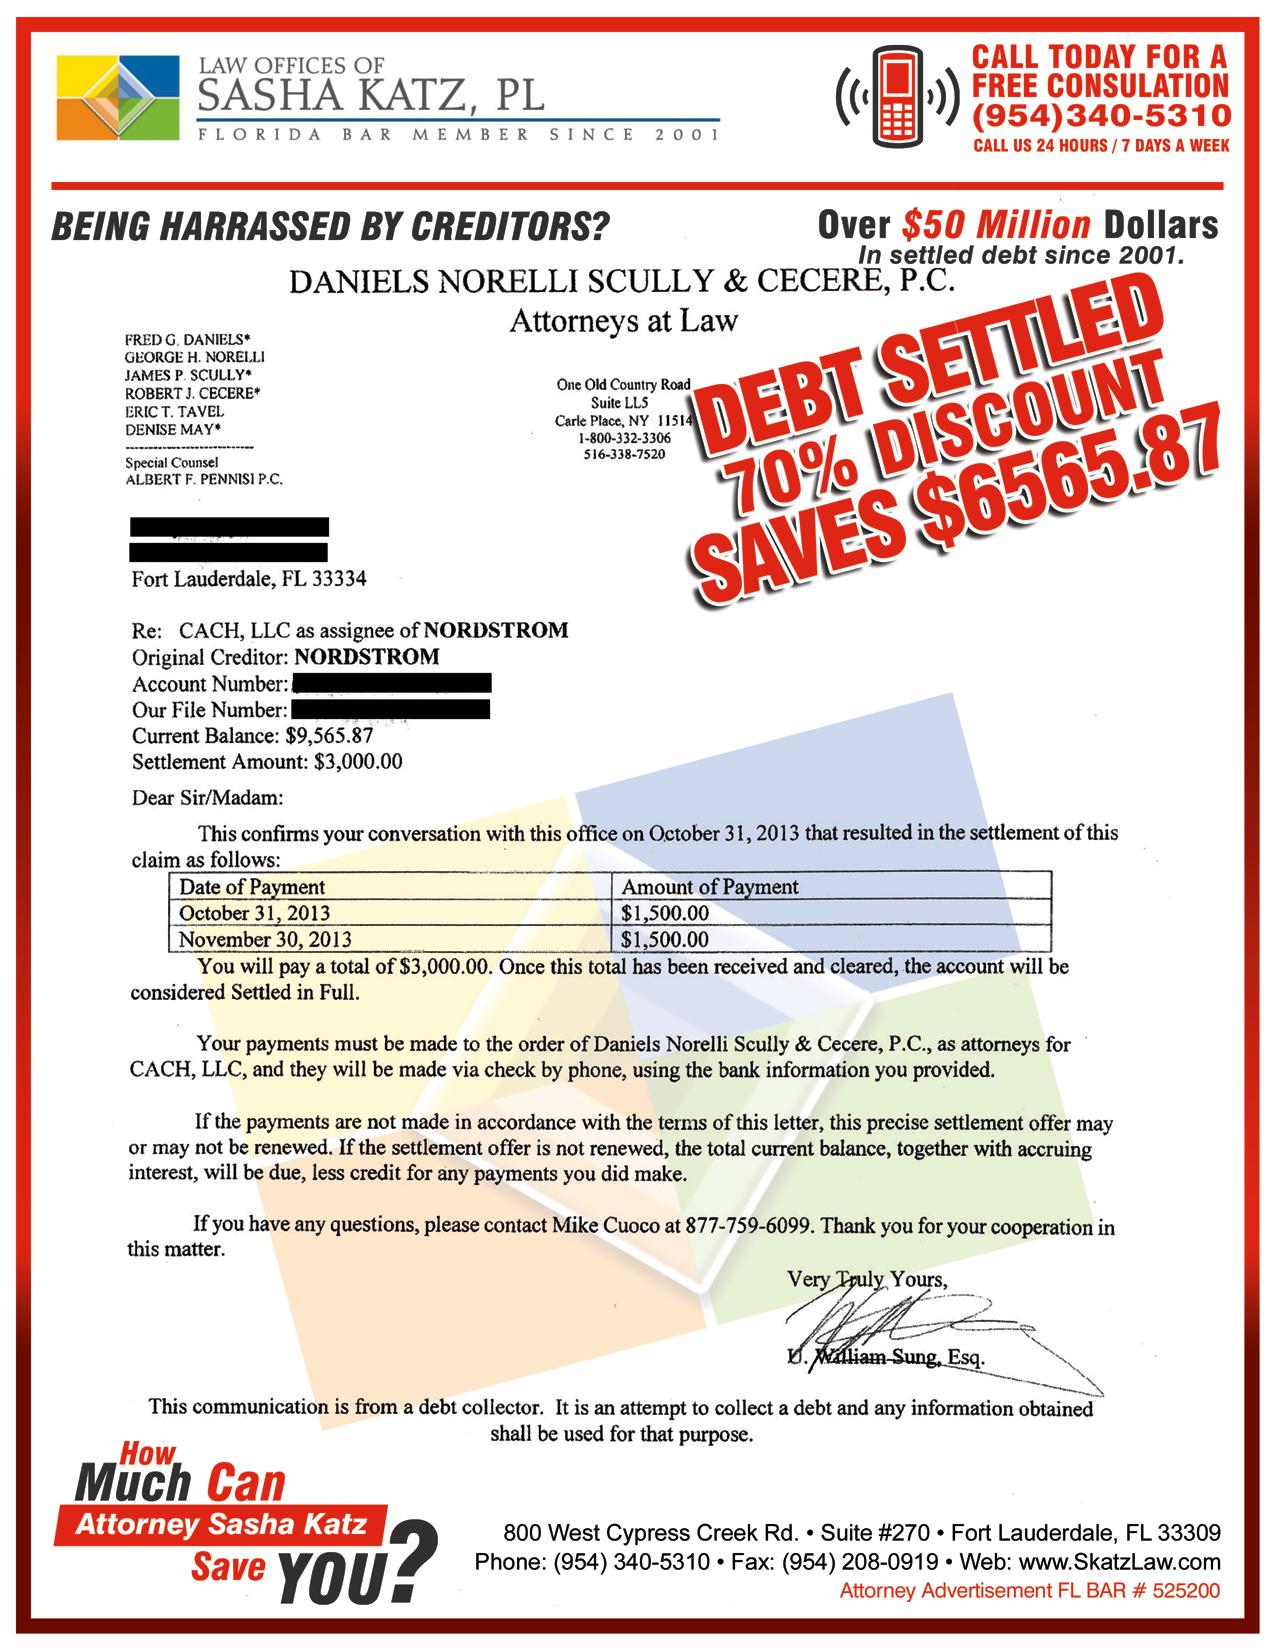 settlement_letter003-2014 - Copy